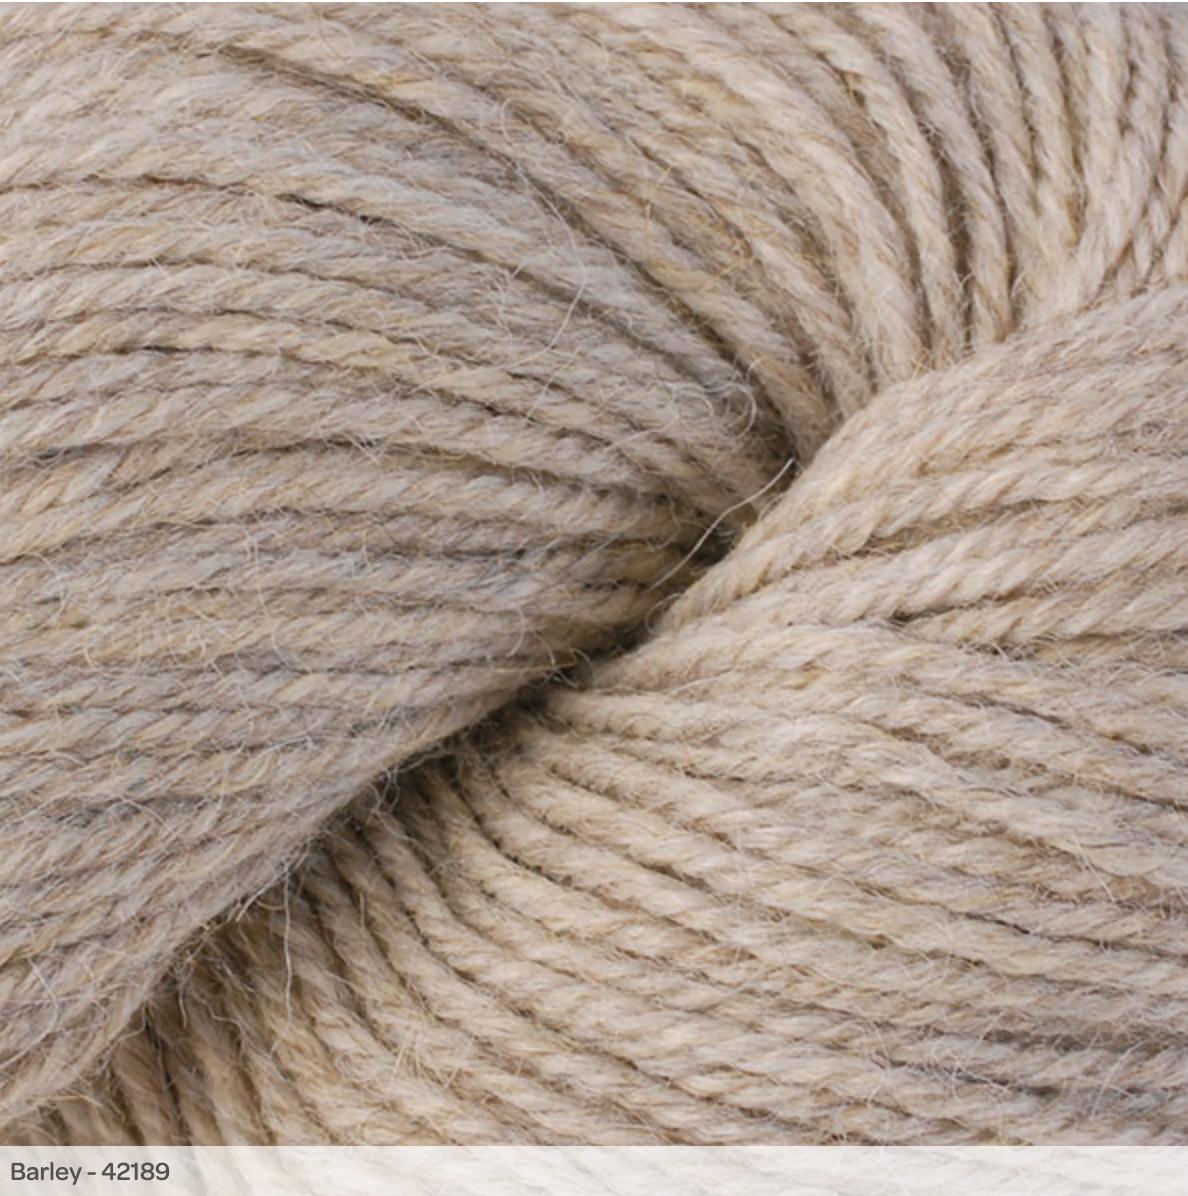 Berroco Ultra Alpaca Light - Barley - 42189